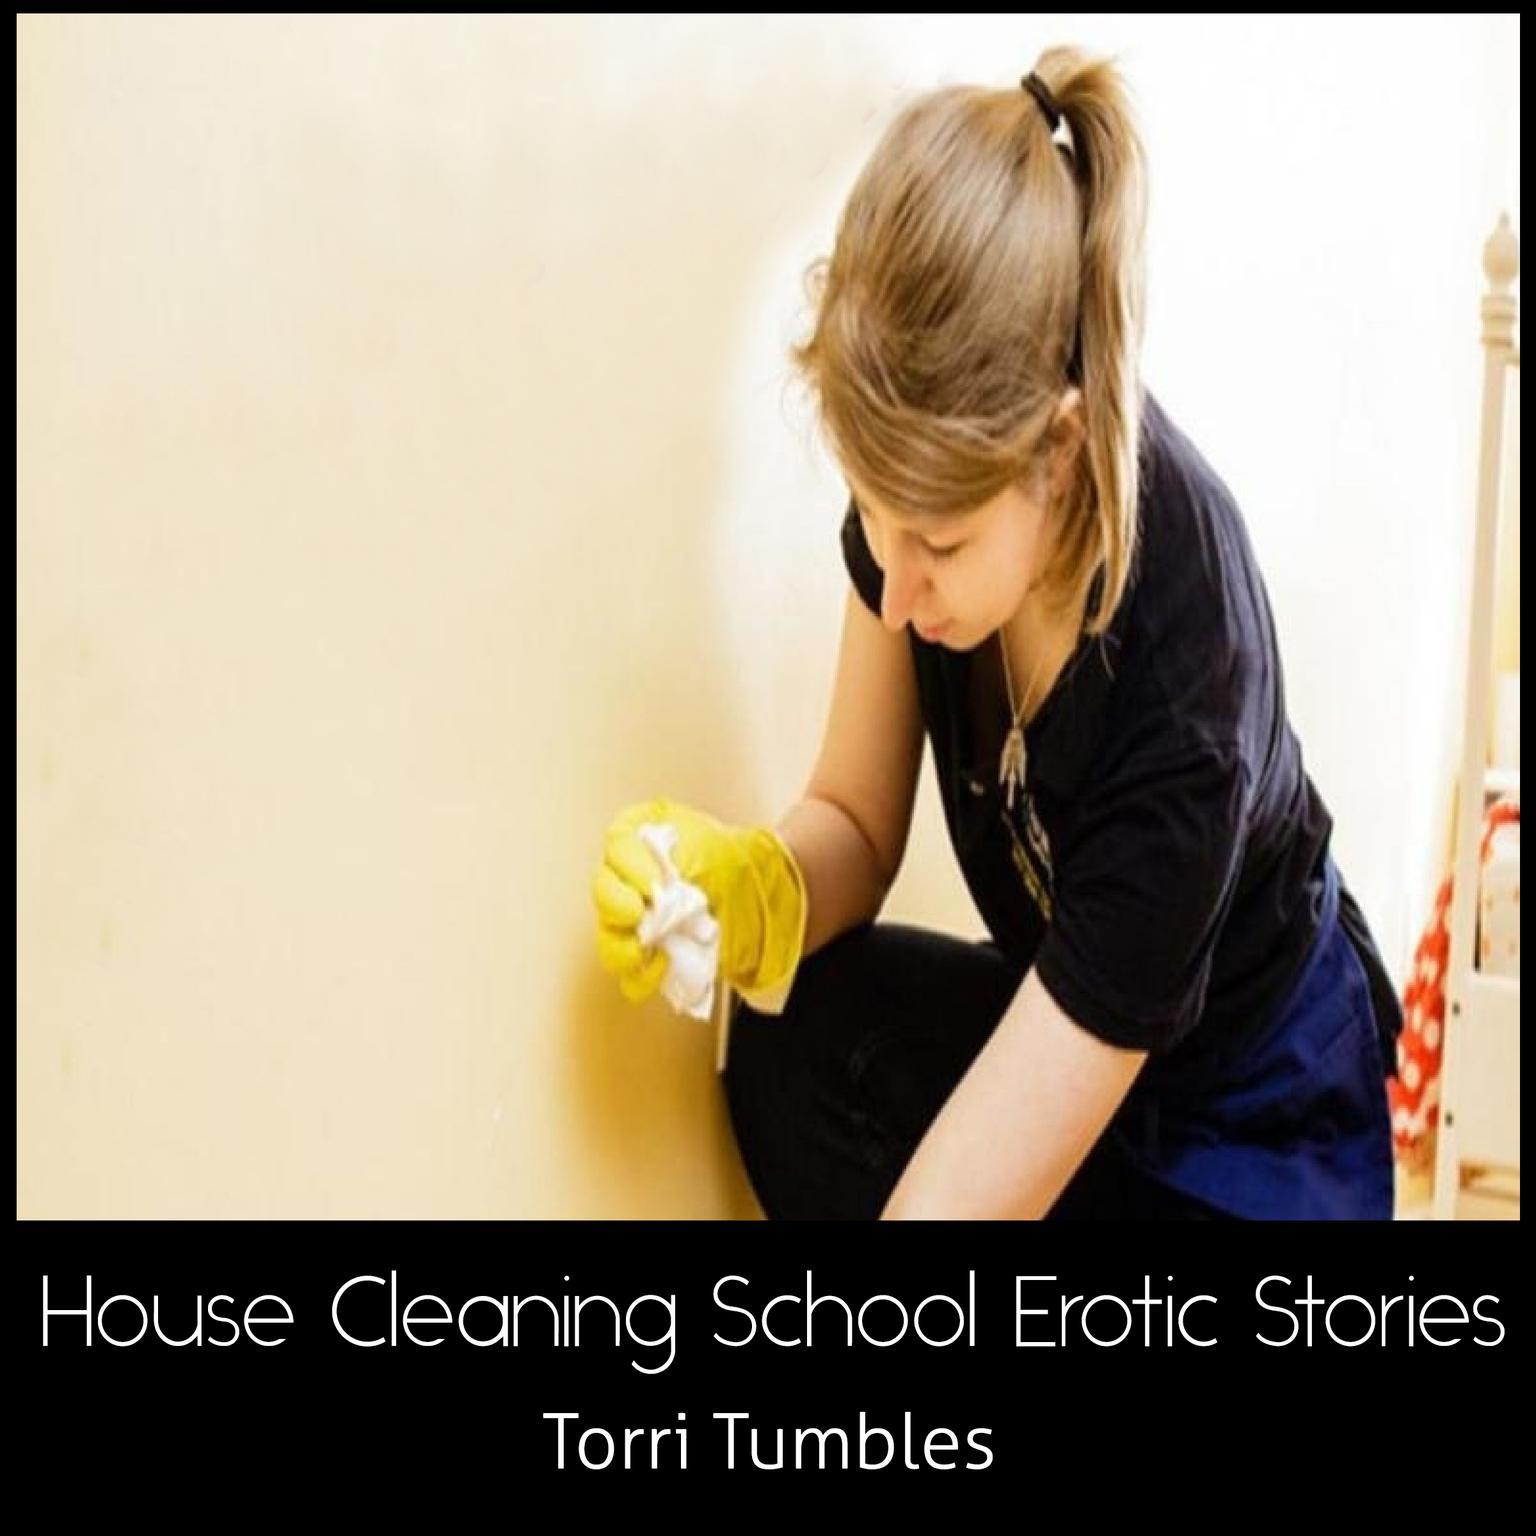 House Cleaning School Erotic Stories  Audiobook, by Torri Tumbles